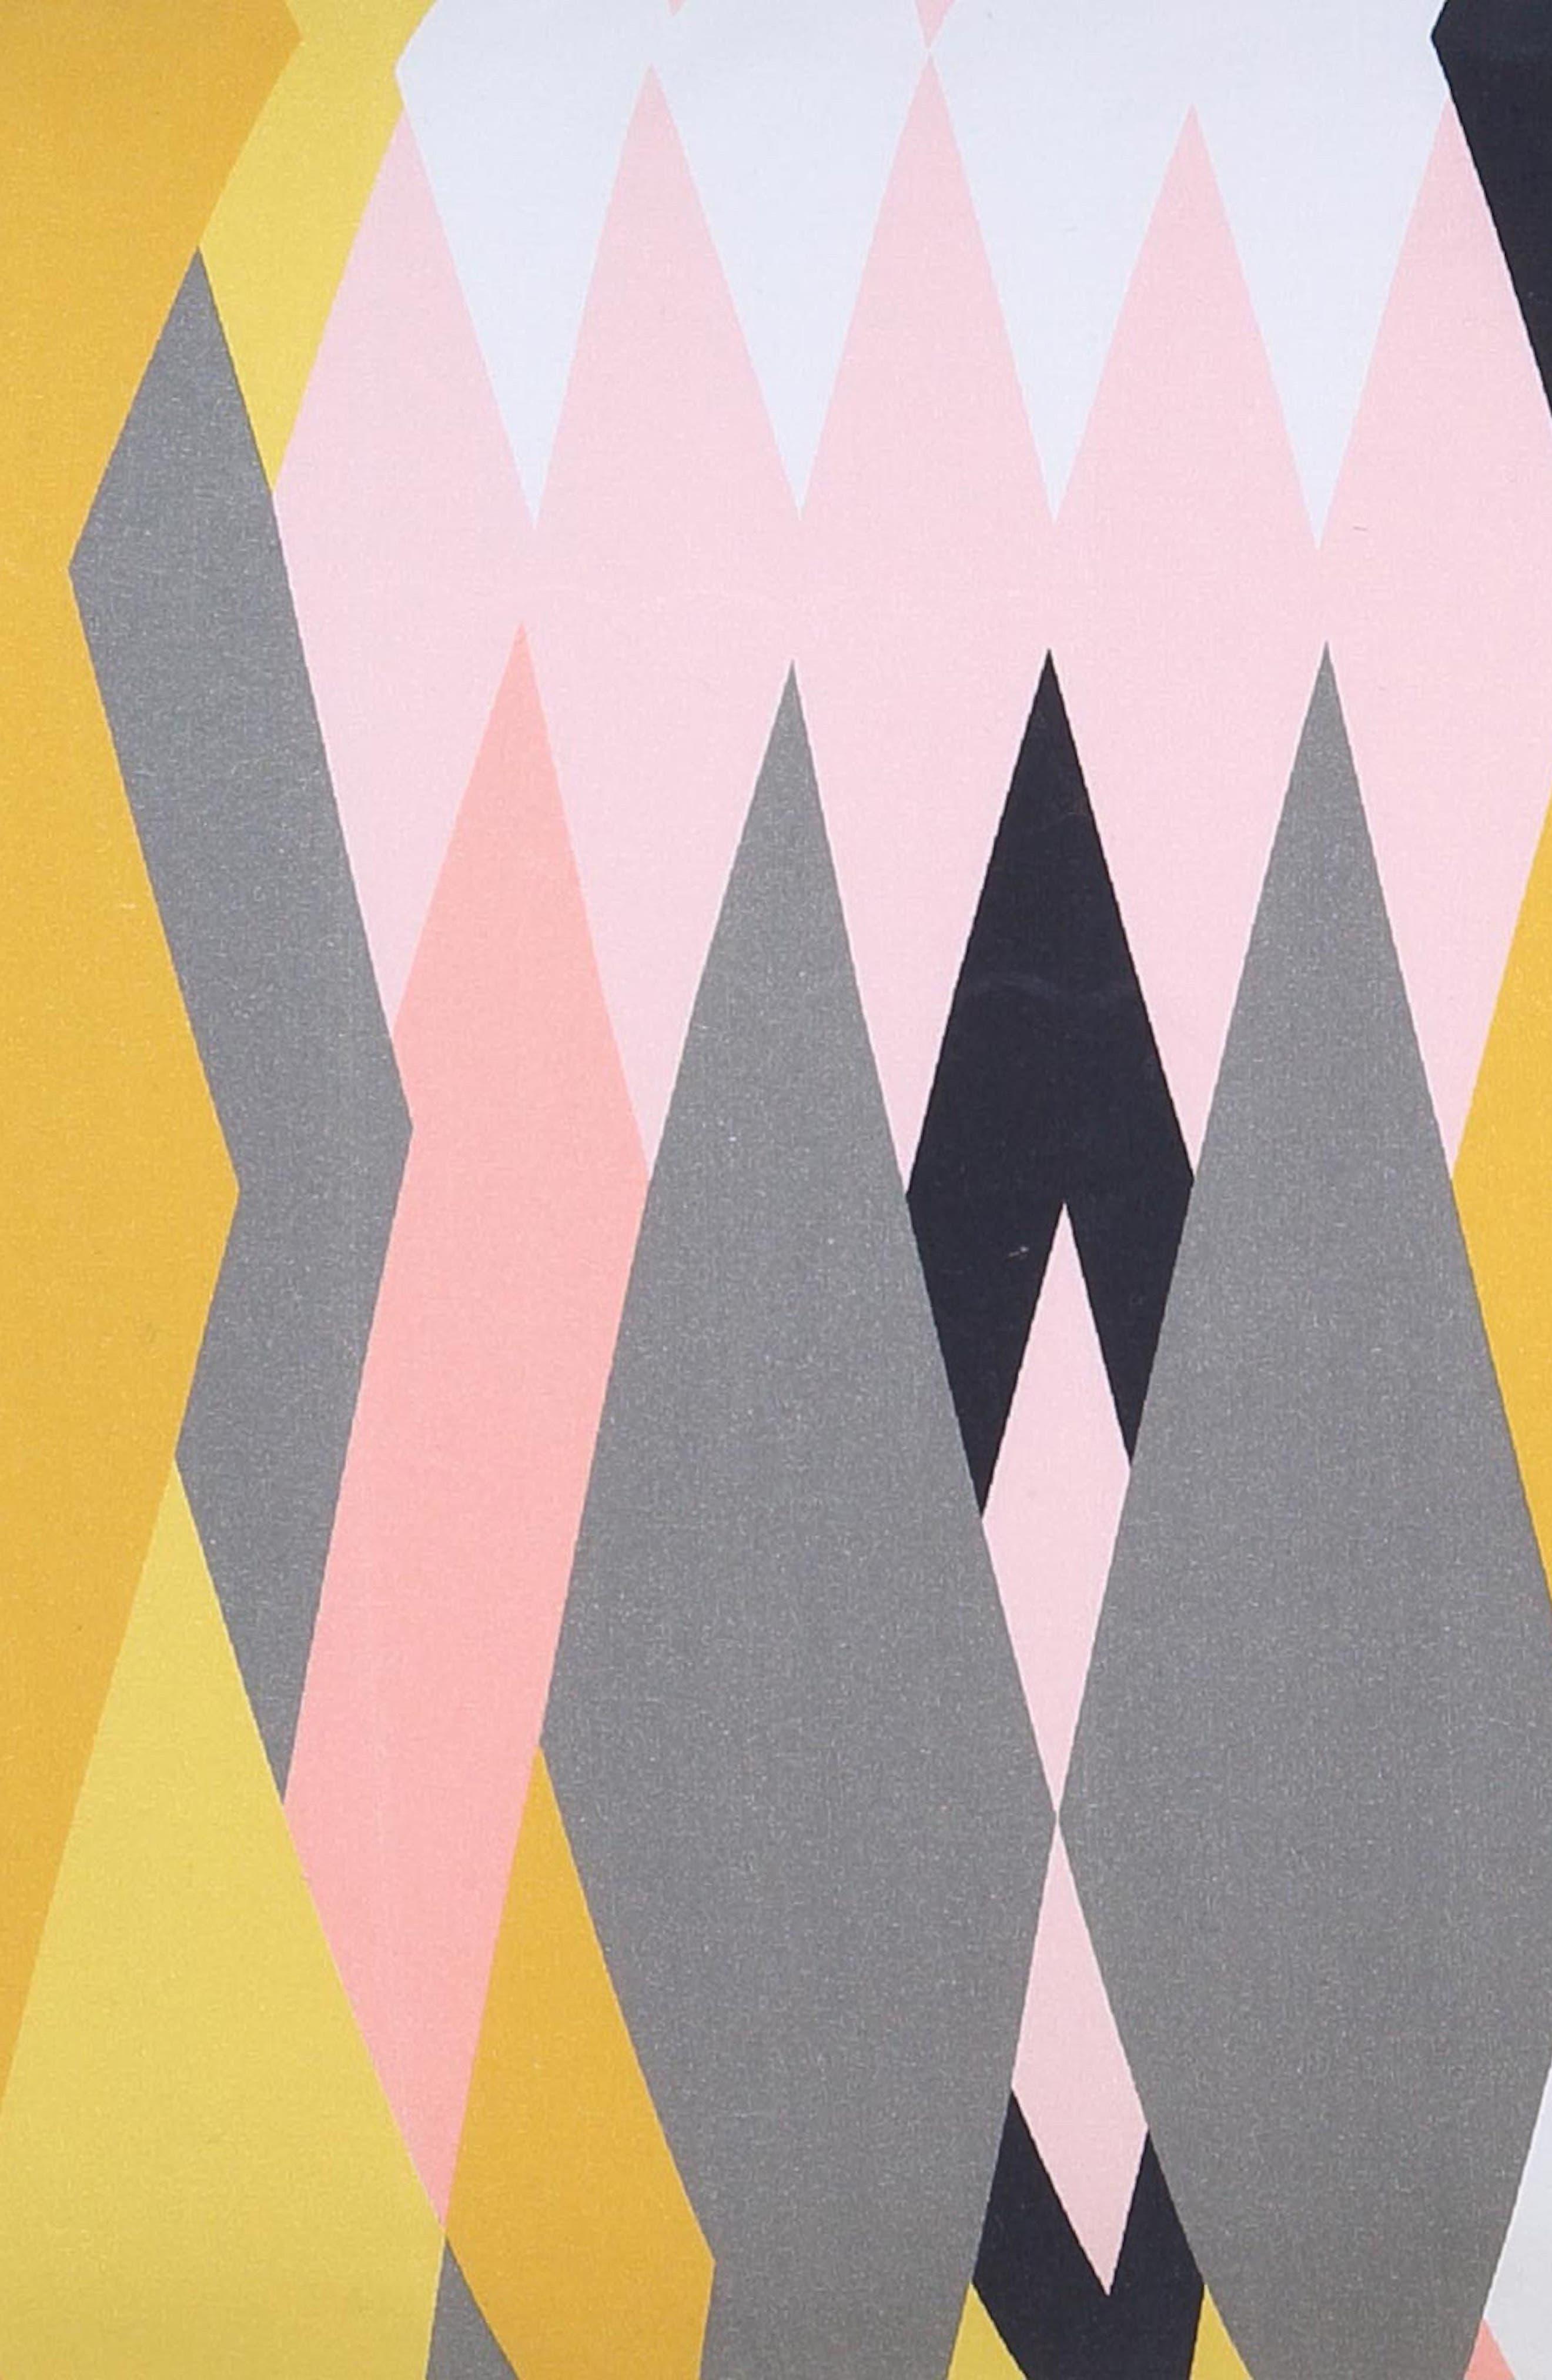 Croc Desert Cotton Sheet,                             Alternate thumbnail 3, color,                             Multi